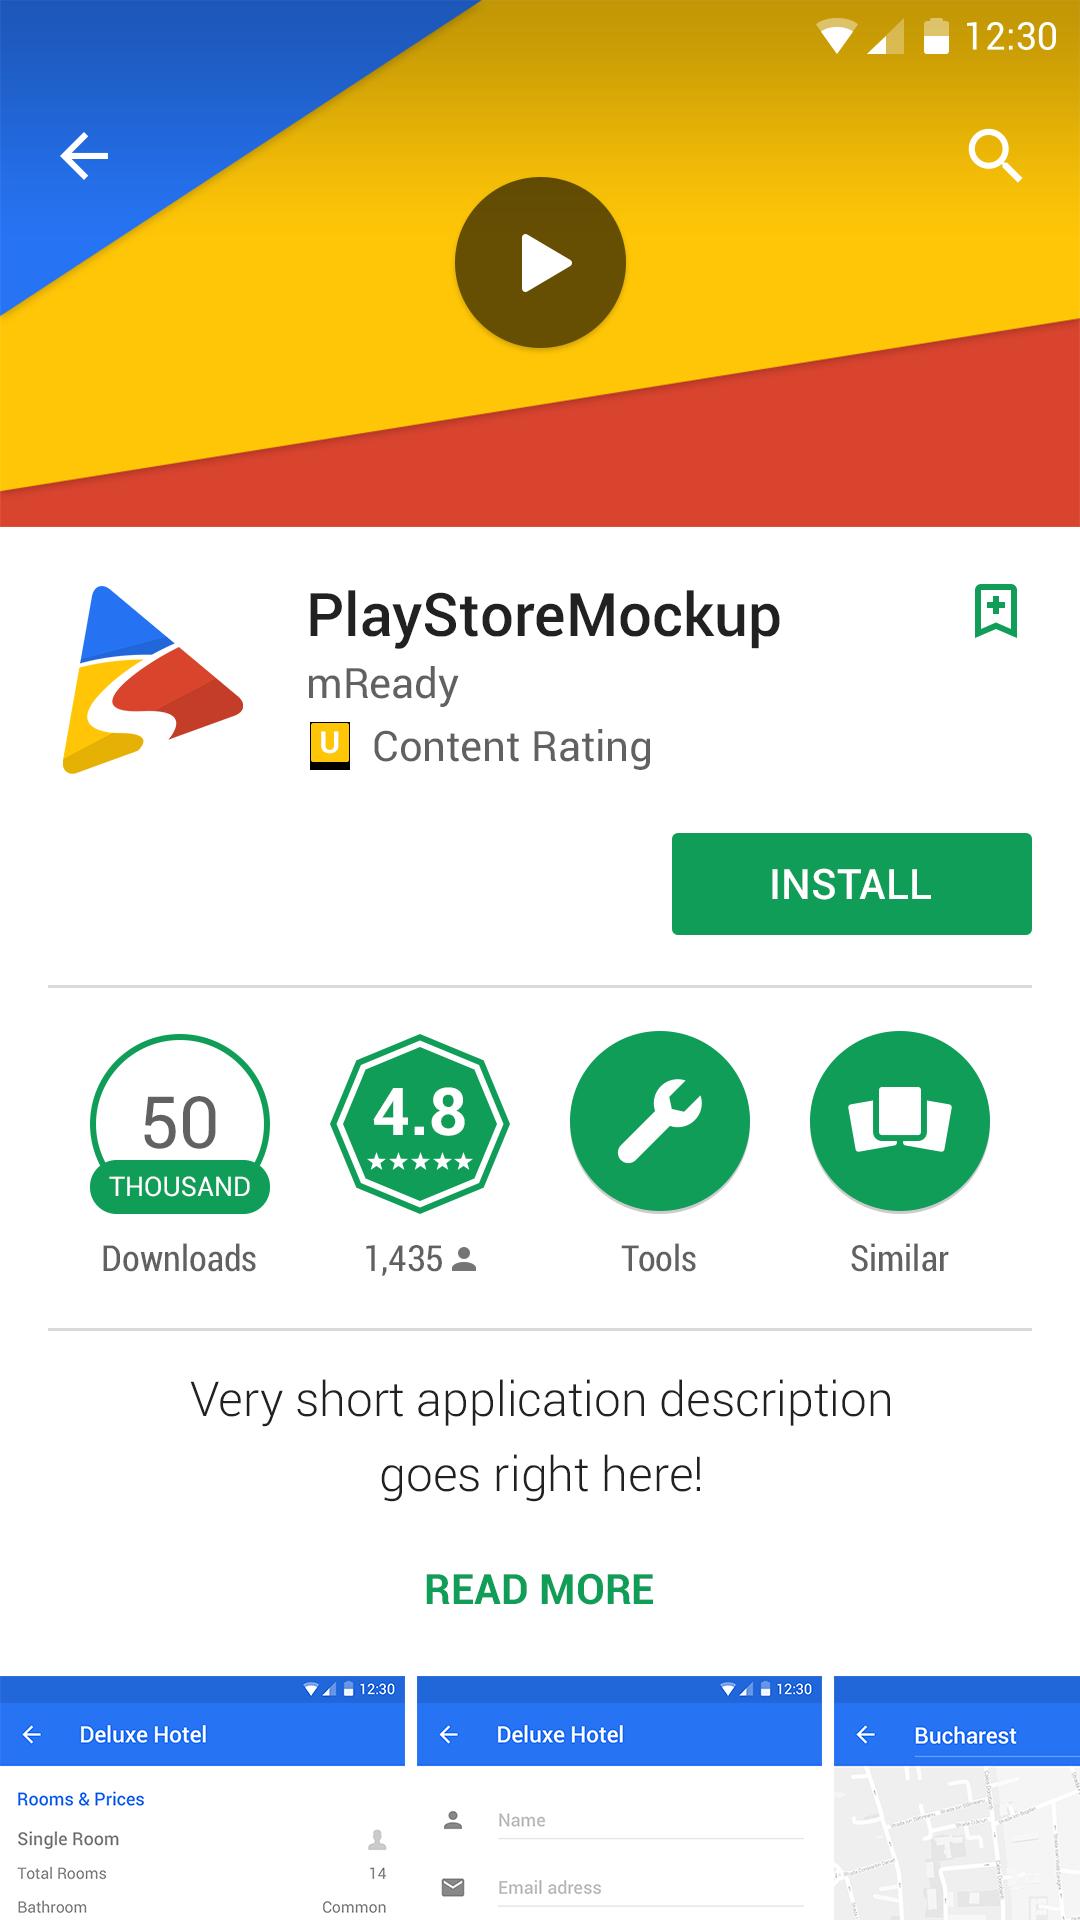 Play Store Mockup Free Psd Mready Blog